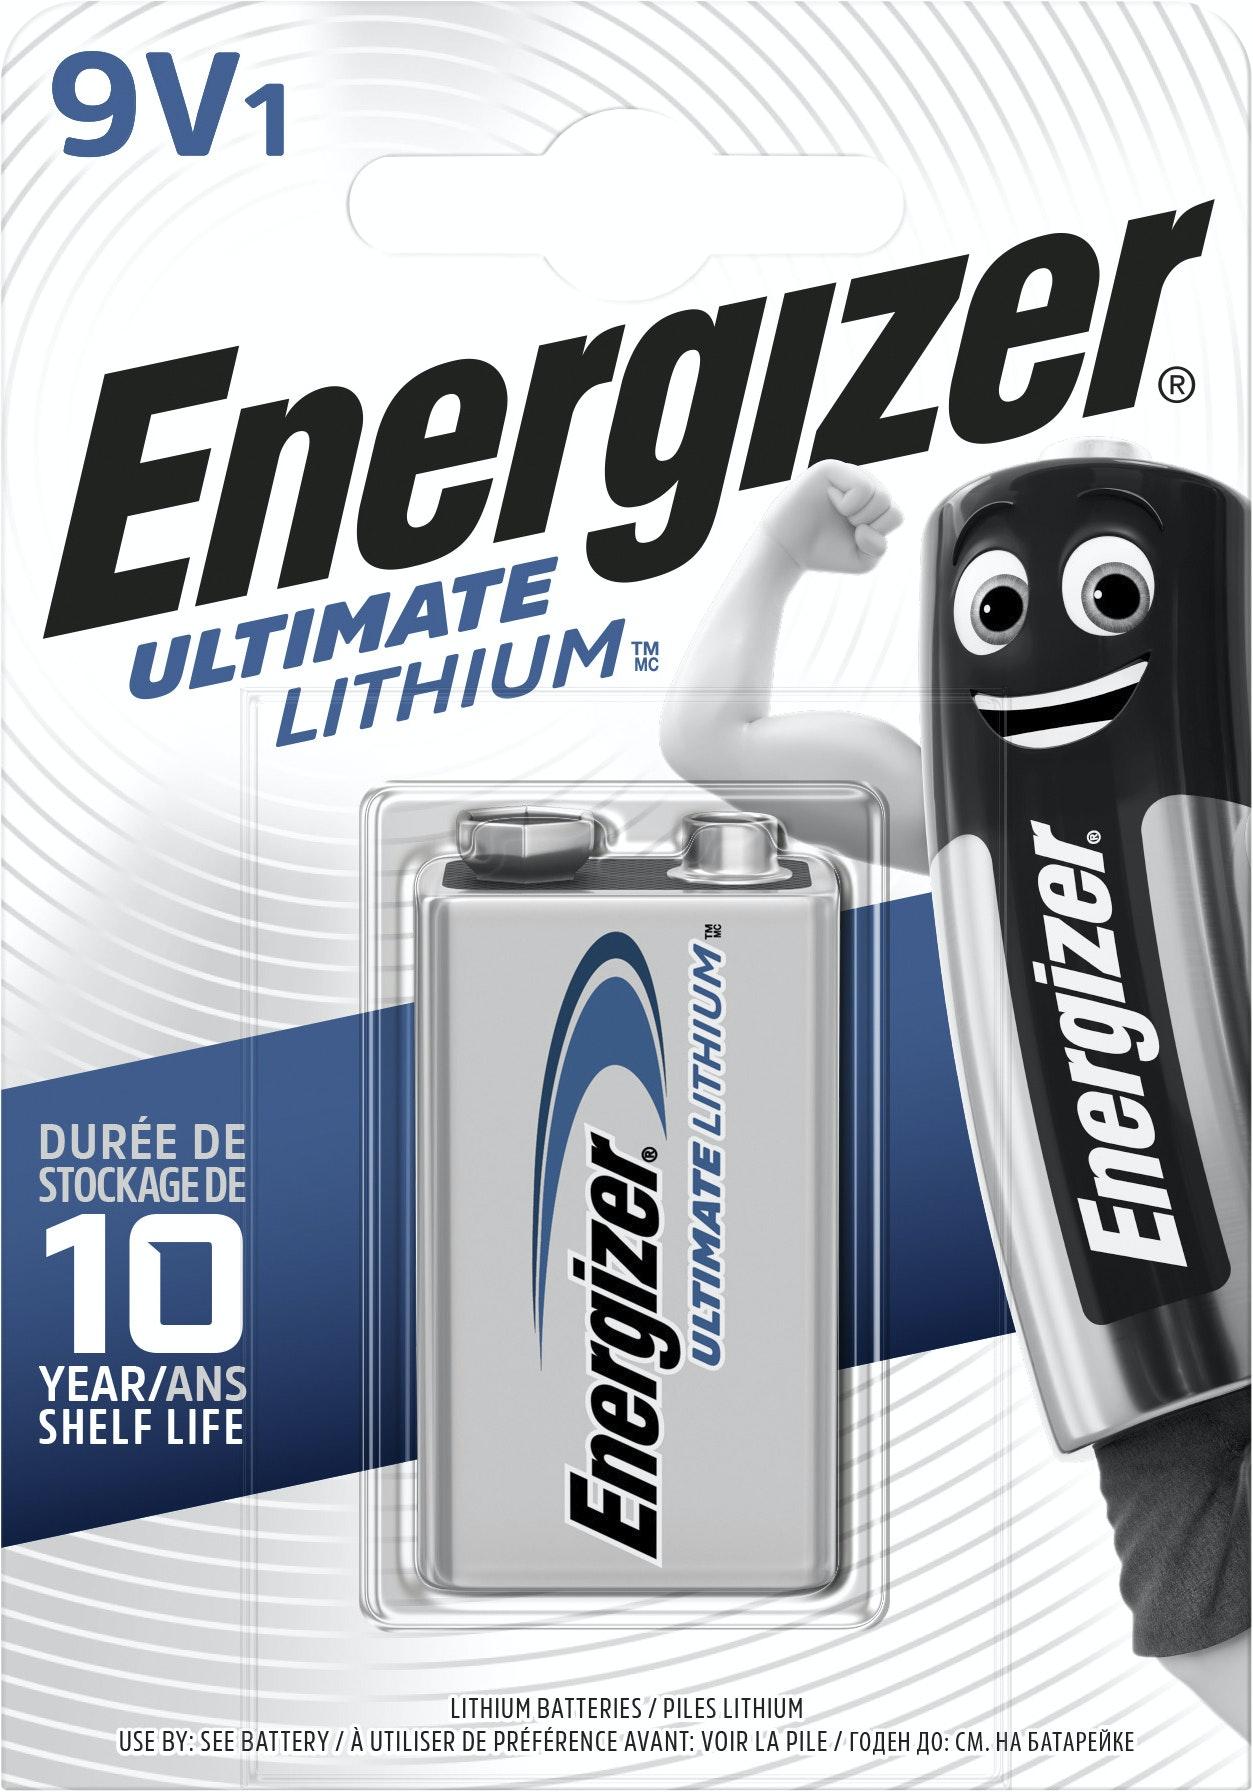 Batteri Ultimate Lithium 9V Fsb1